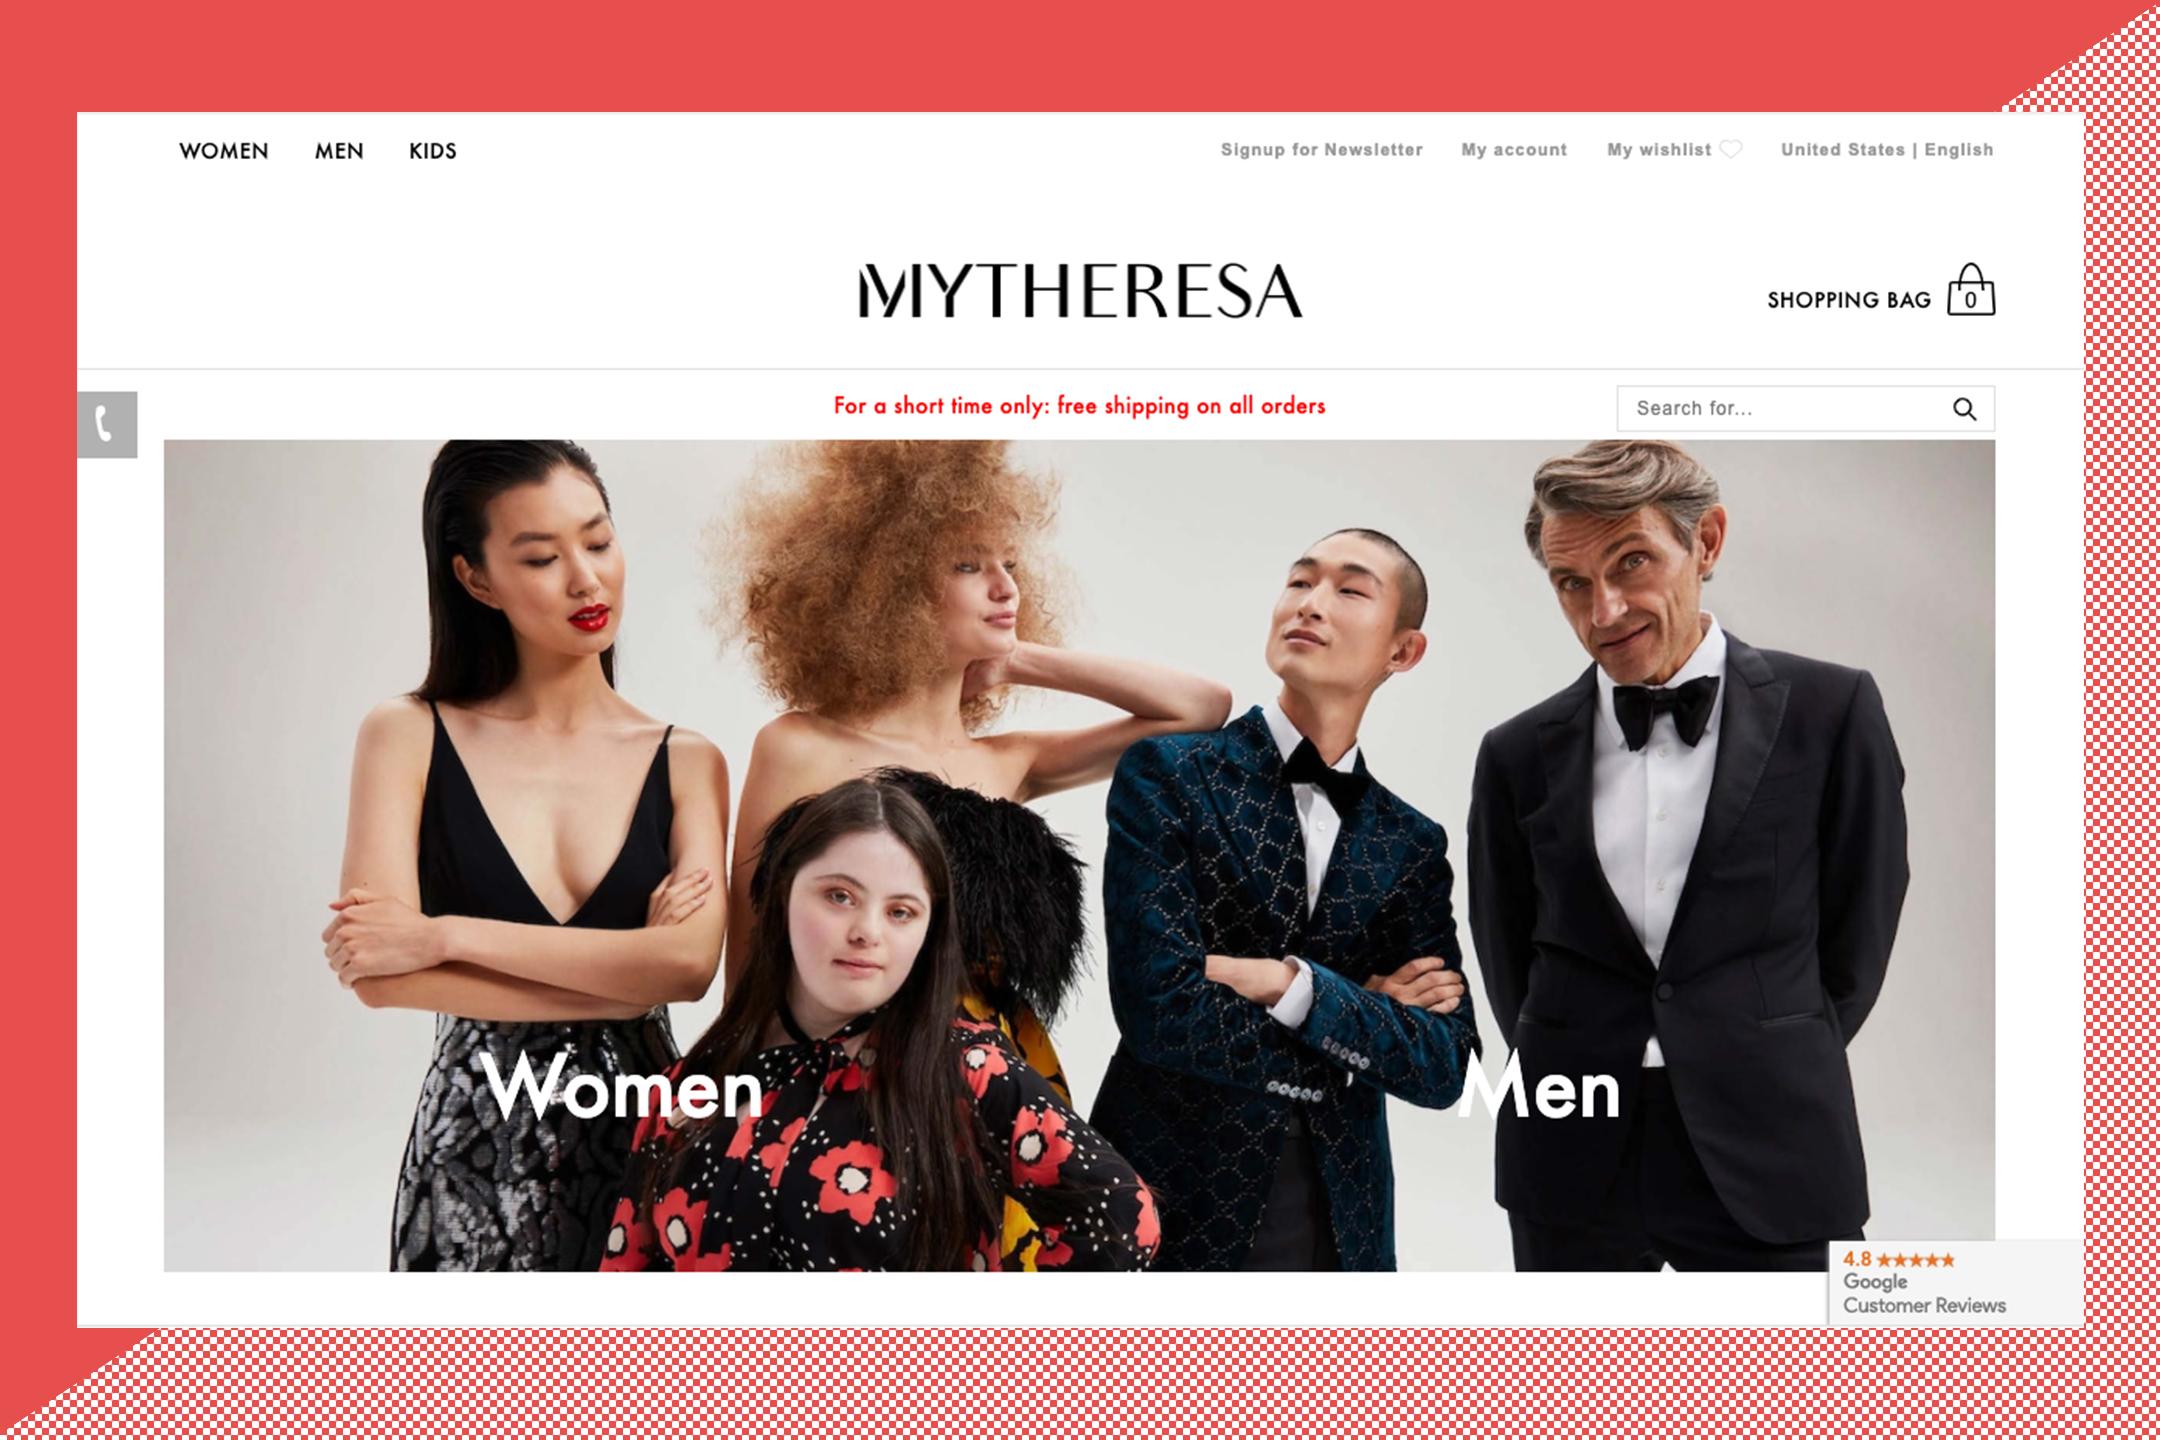 The home page for Mytheresa.com.